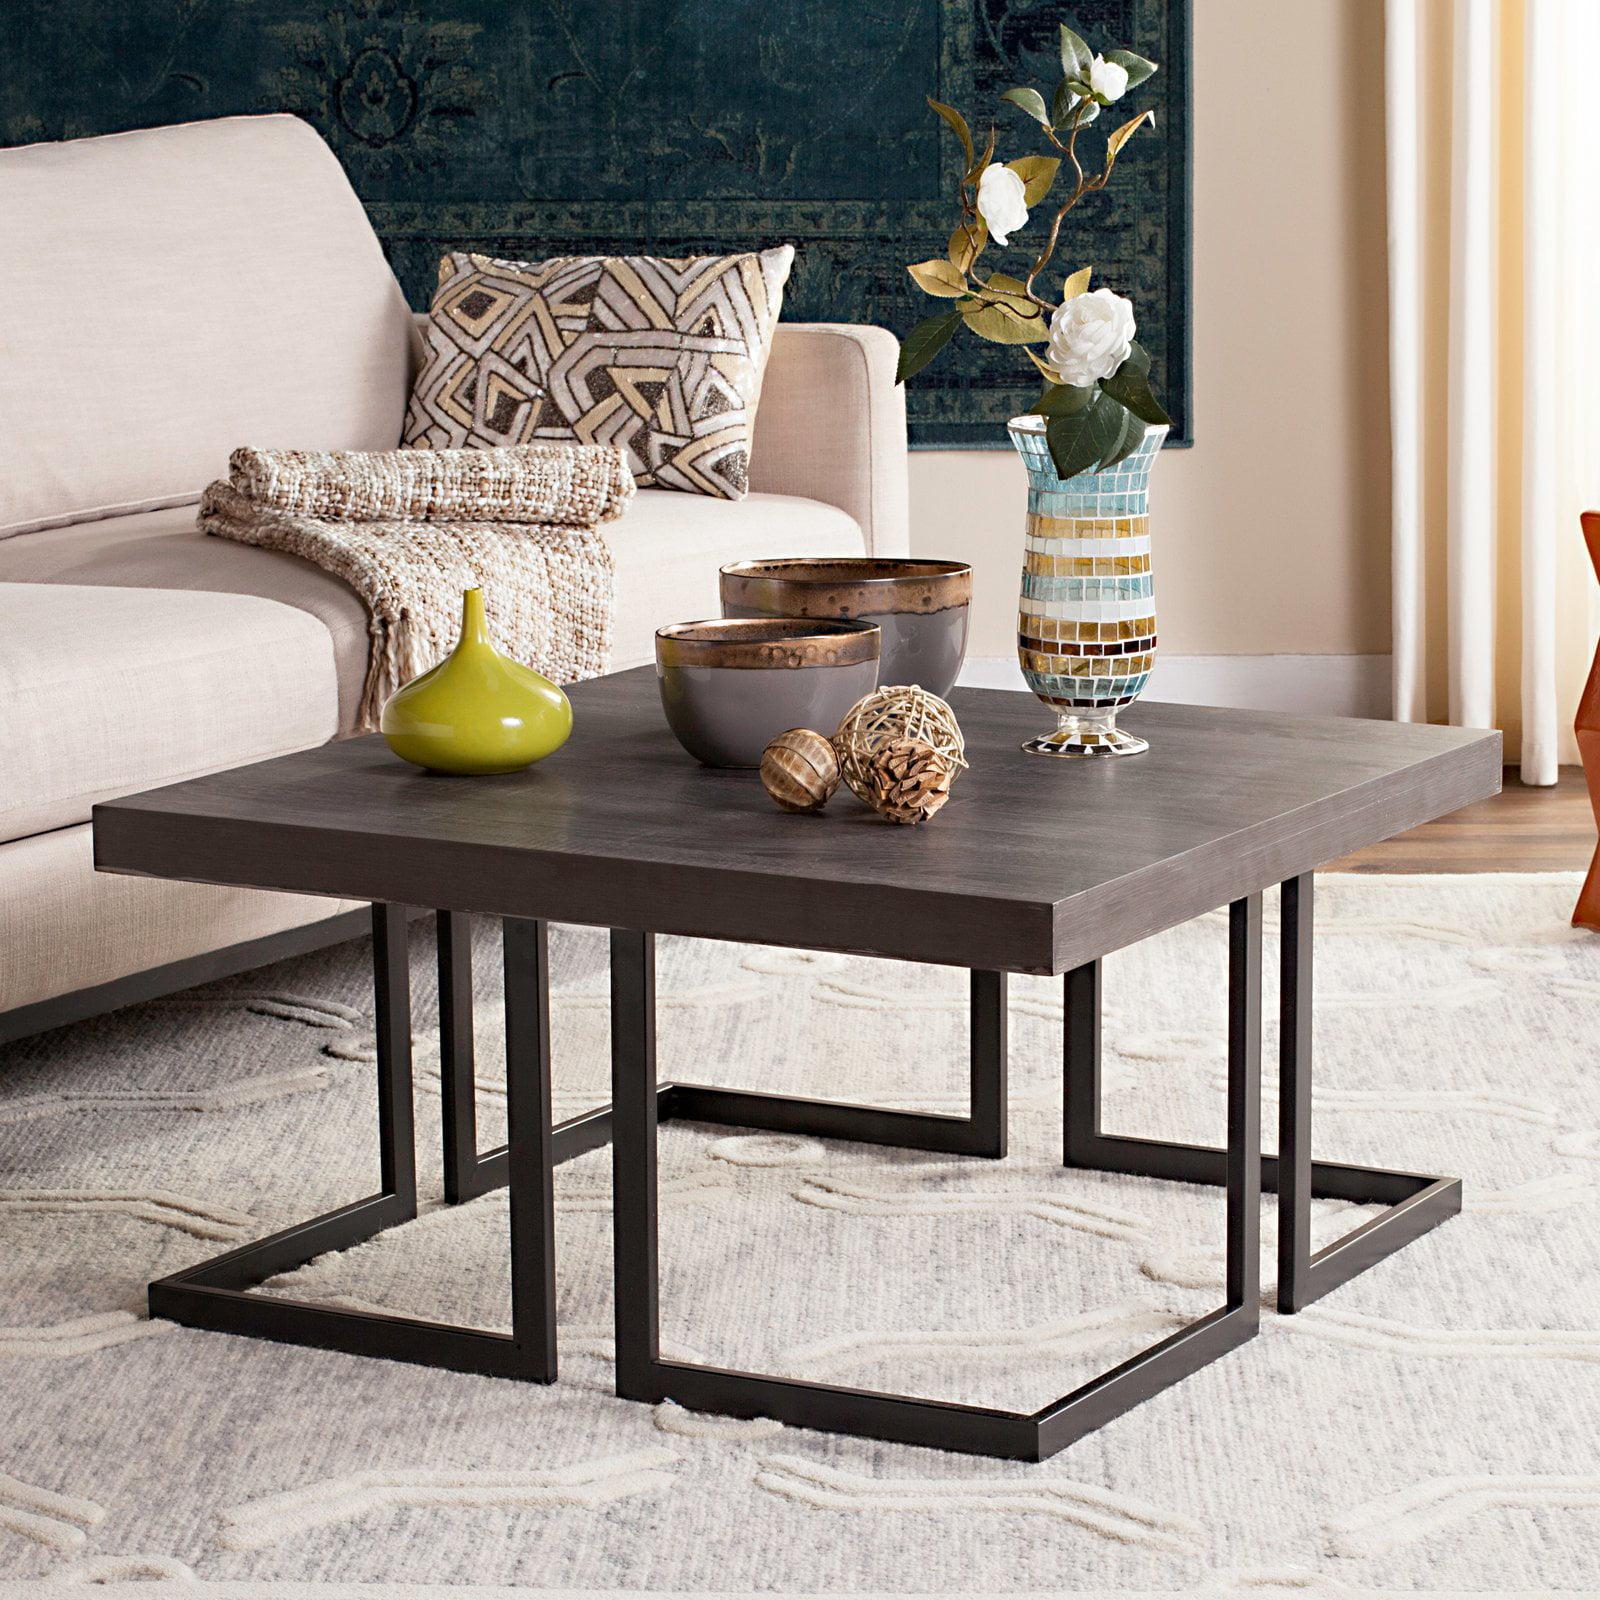 "Safavieh Amalya 31.5"" Square Modern Mid Century Coffee Table, Dark Grey/Black"